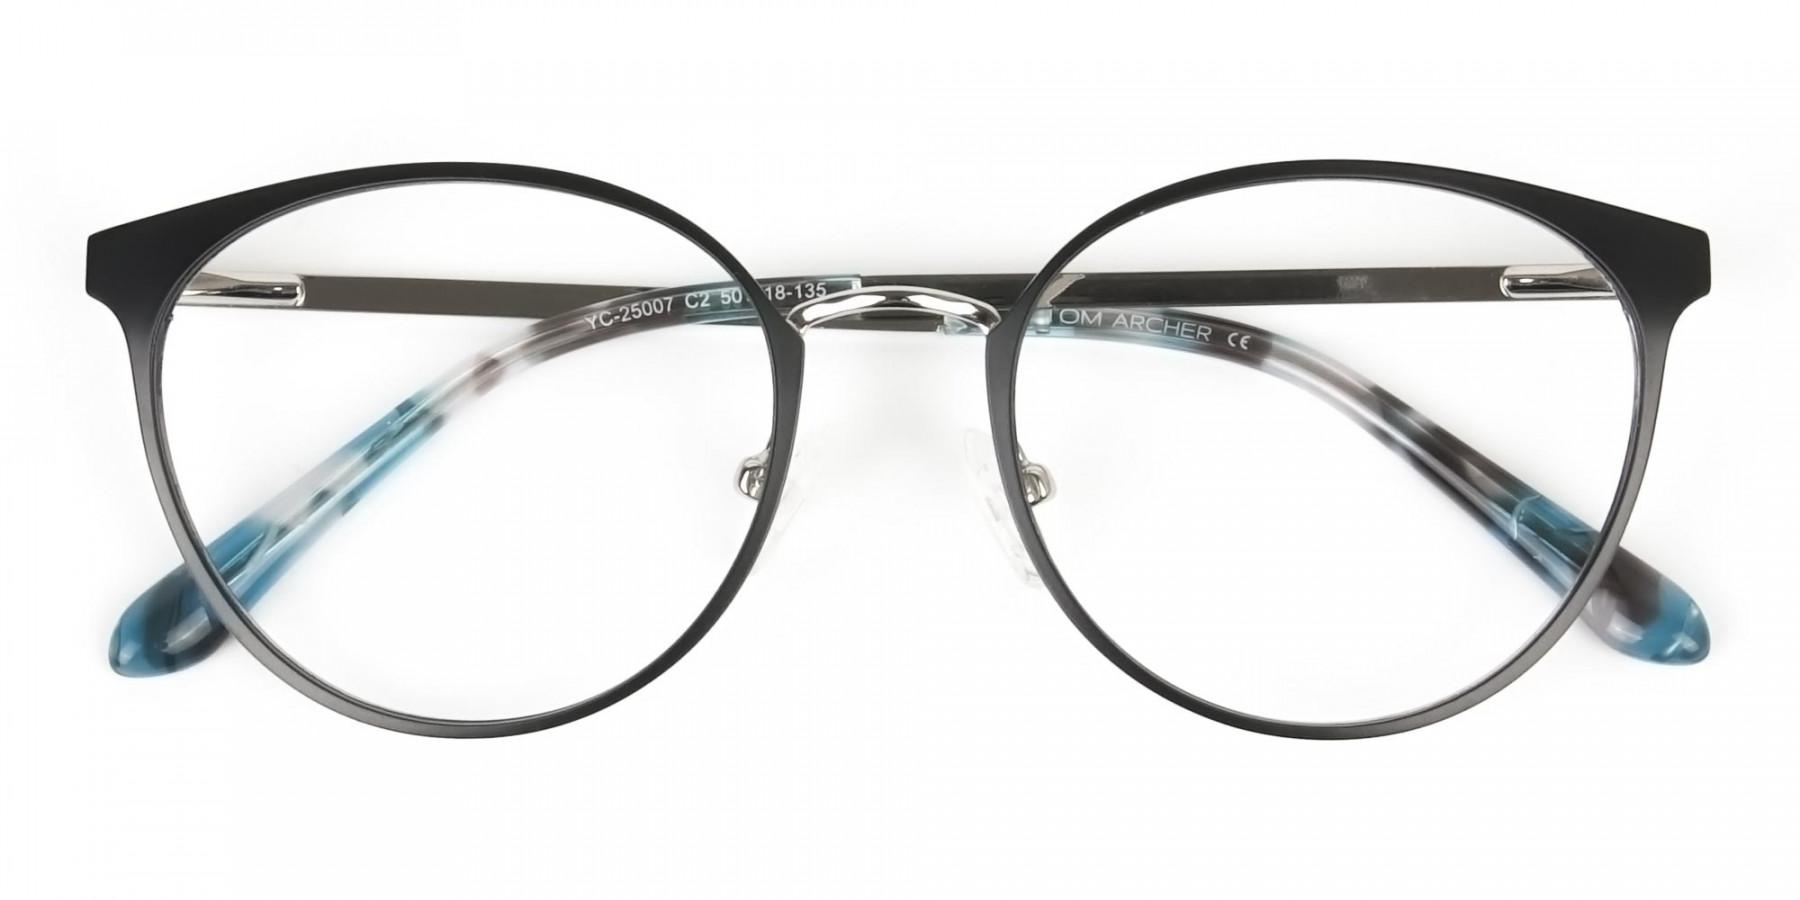 Silver Black Metal Glasses in Round Men Women - 1